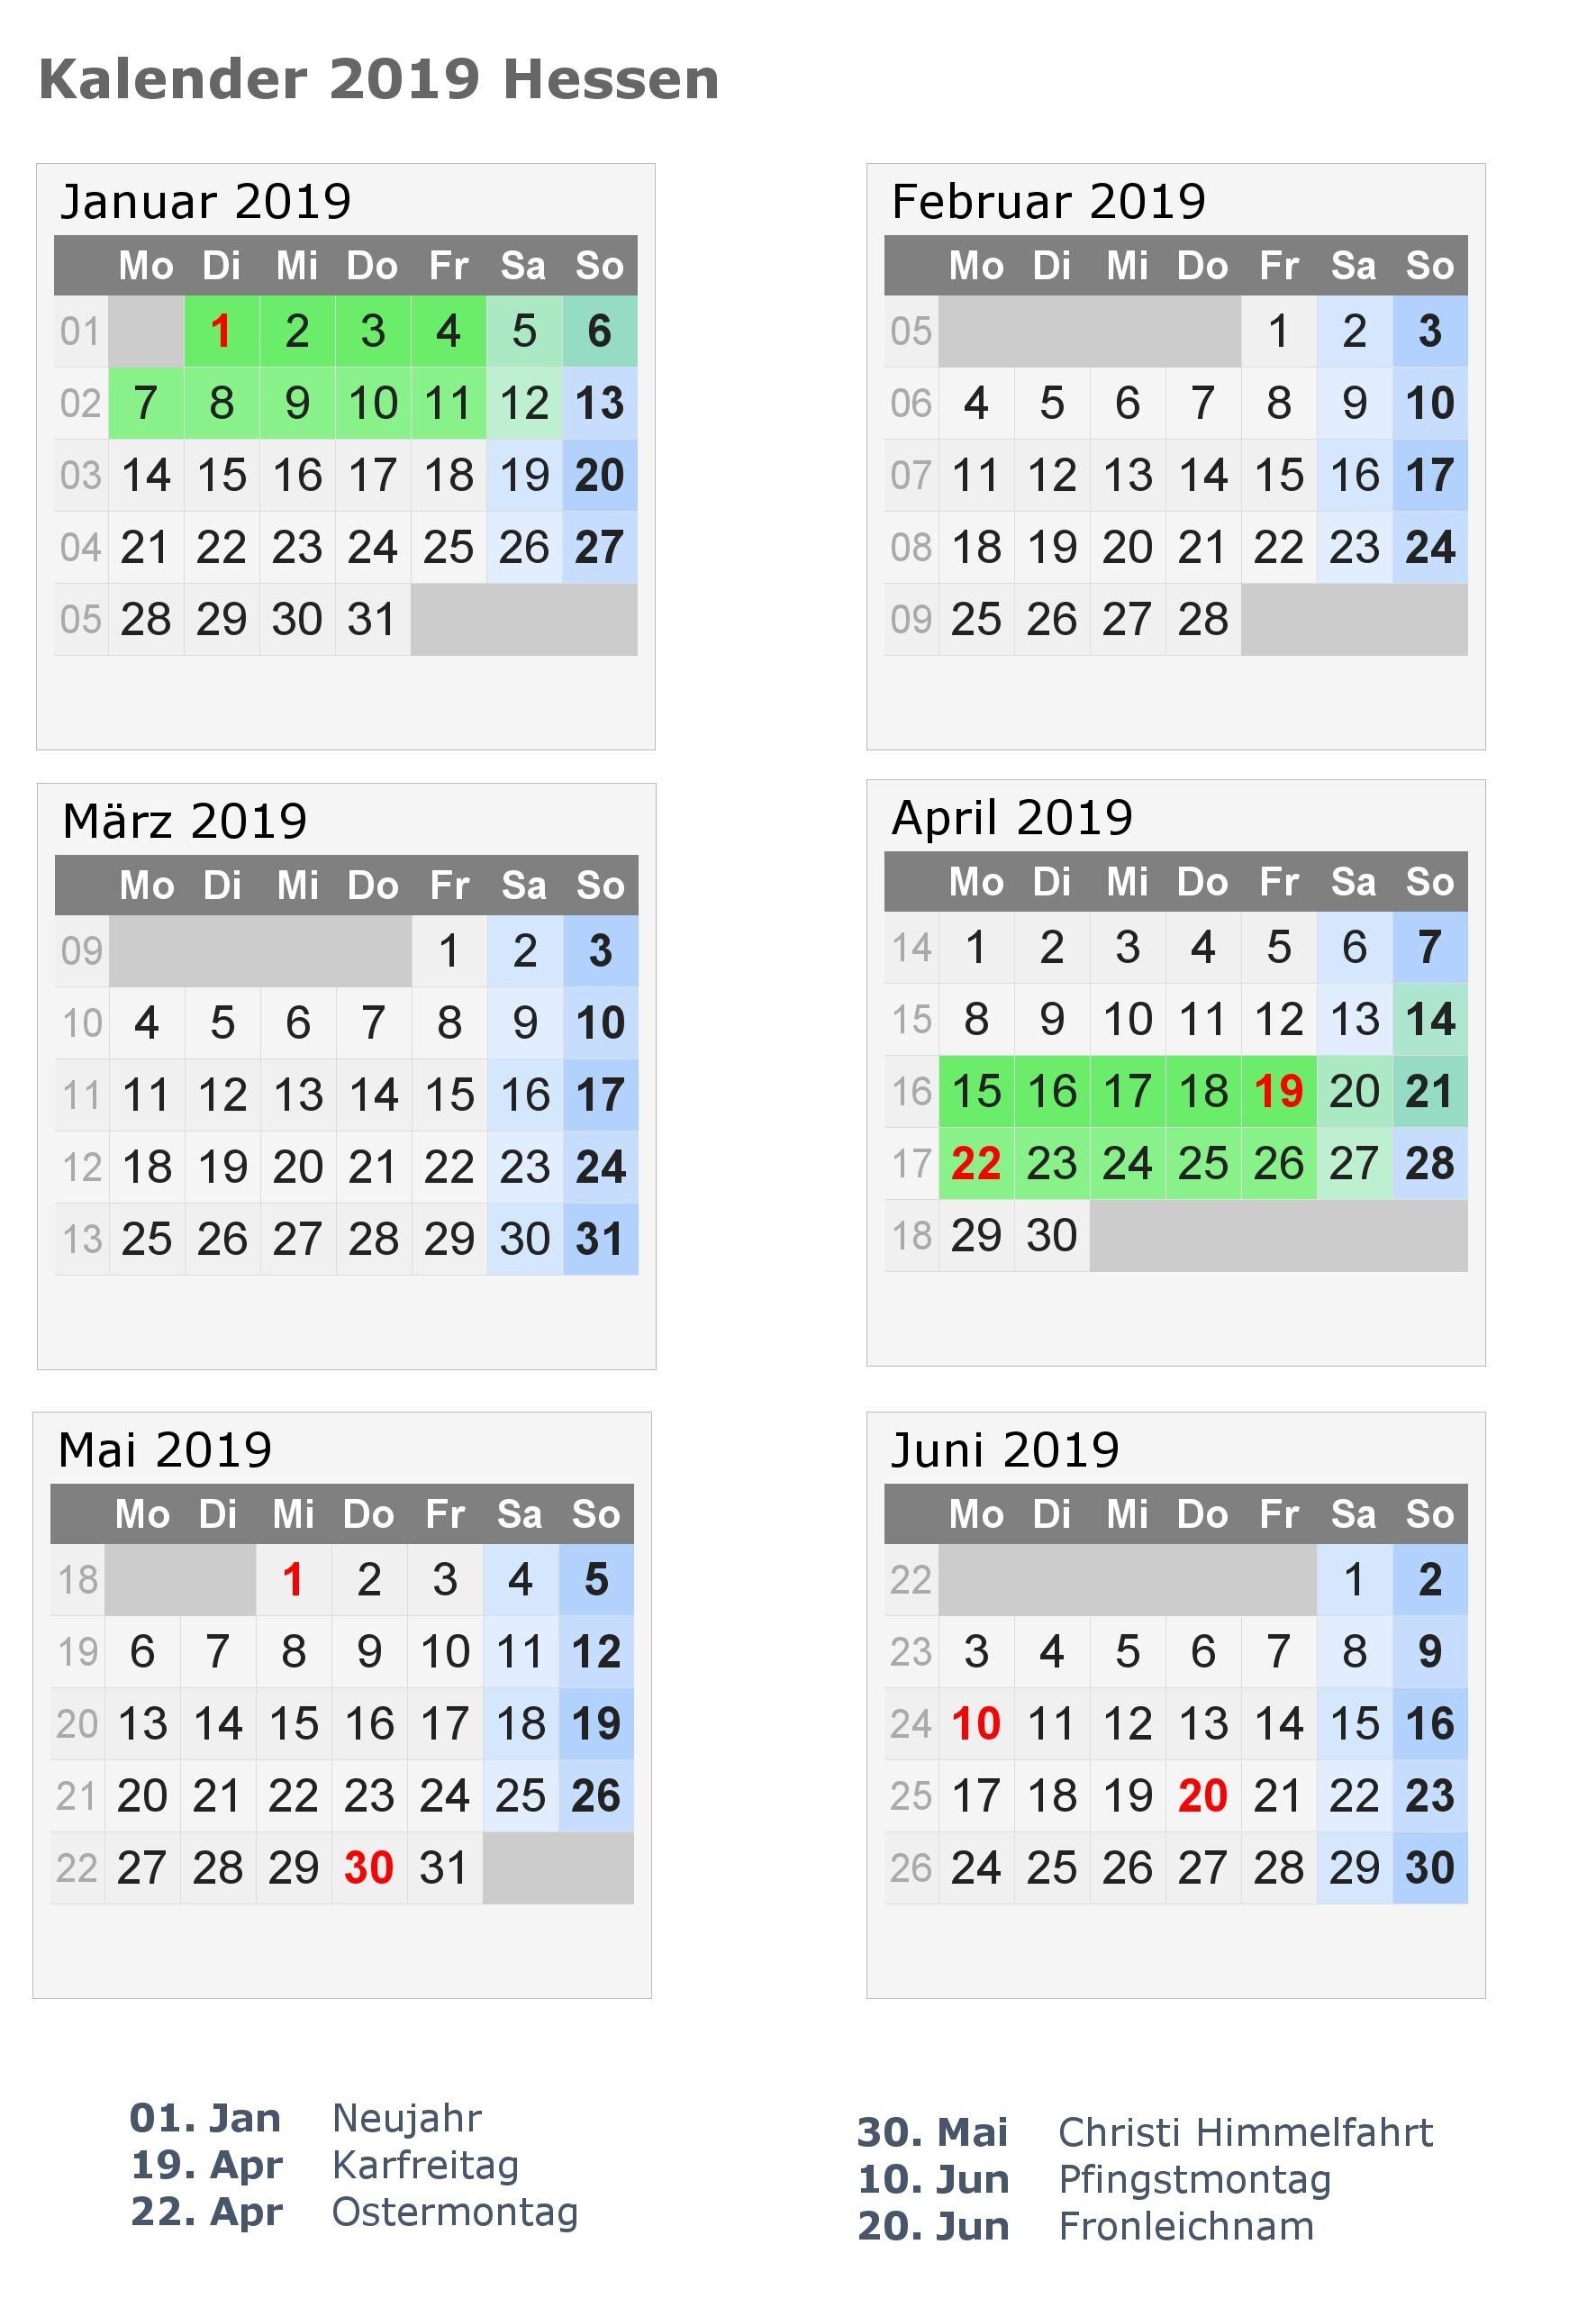 Calendario Enero 2019 Para Imprimir A4 Más Reciente Verificar Kalender 2019 Pdf Din A3 Calendario 2019 Of Calendario Enero 2019 Para Imprimir A4 Más Arriba-a-fecha Calendario Abril 2019 Para Imprimir T